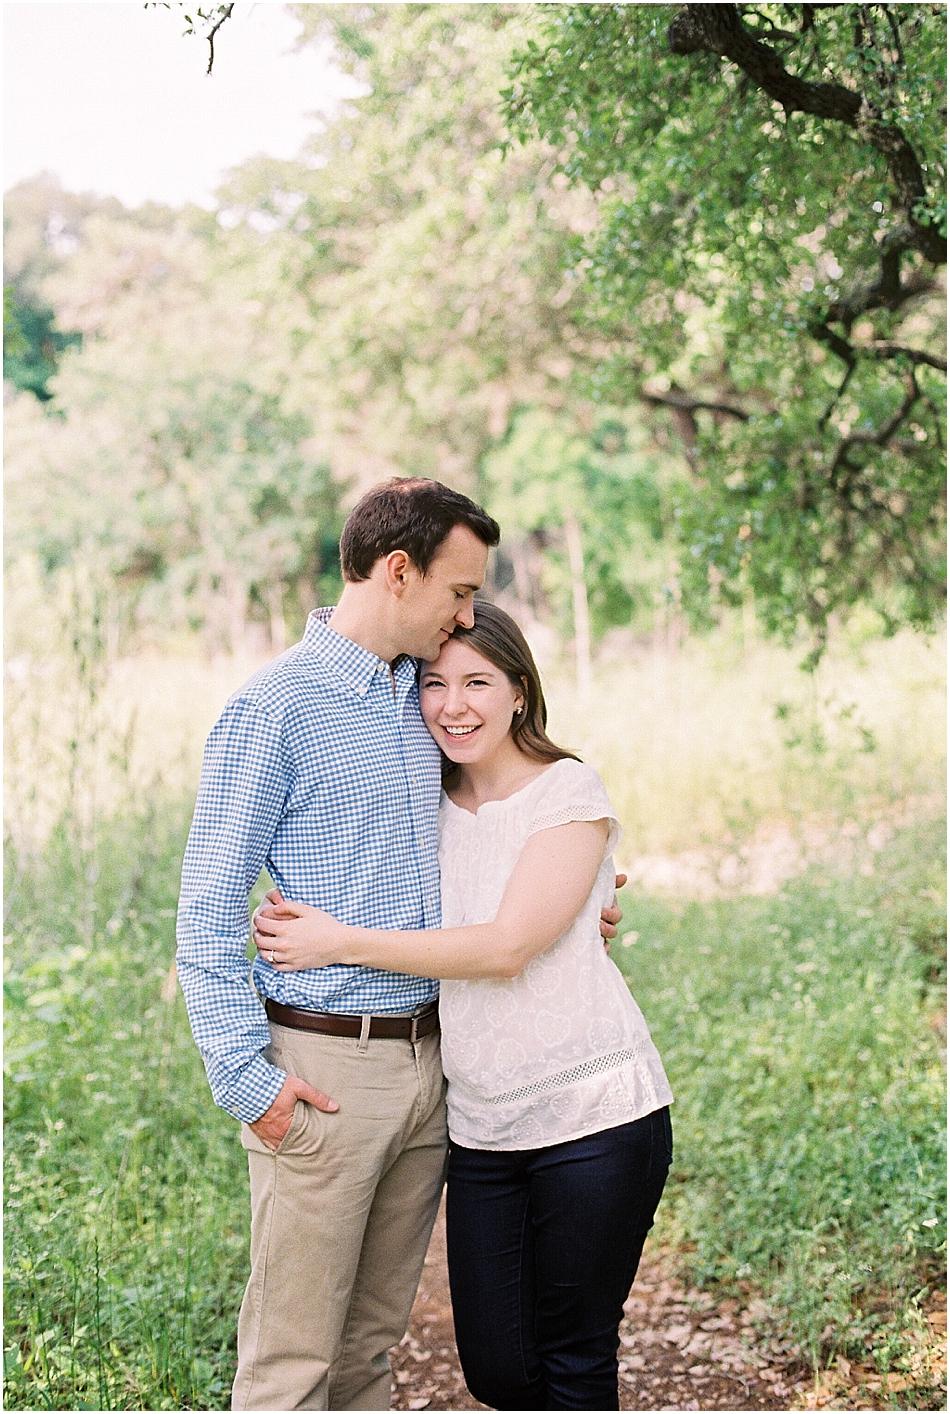 Laura + Nick | Engagement | Fine Art Film | Austin Texas | Emilie Anne Photography-27.jpg